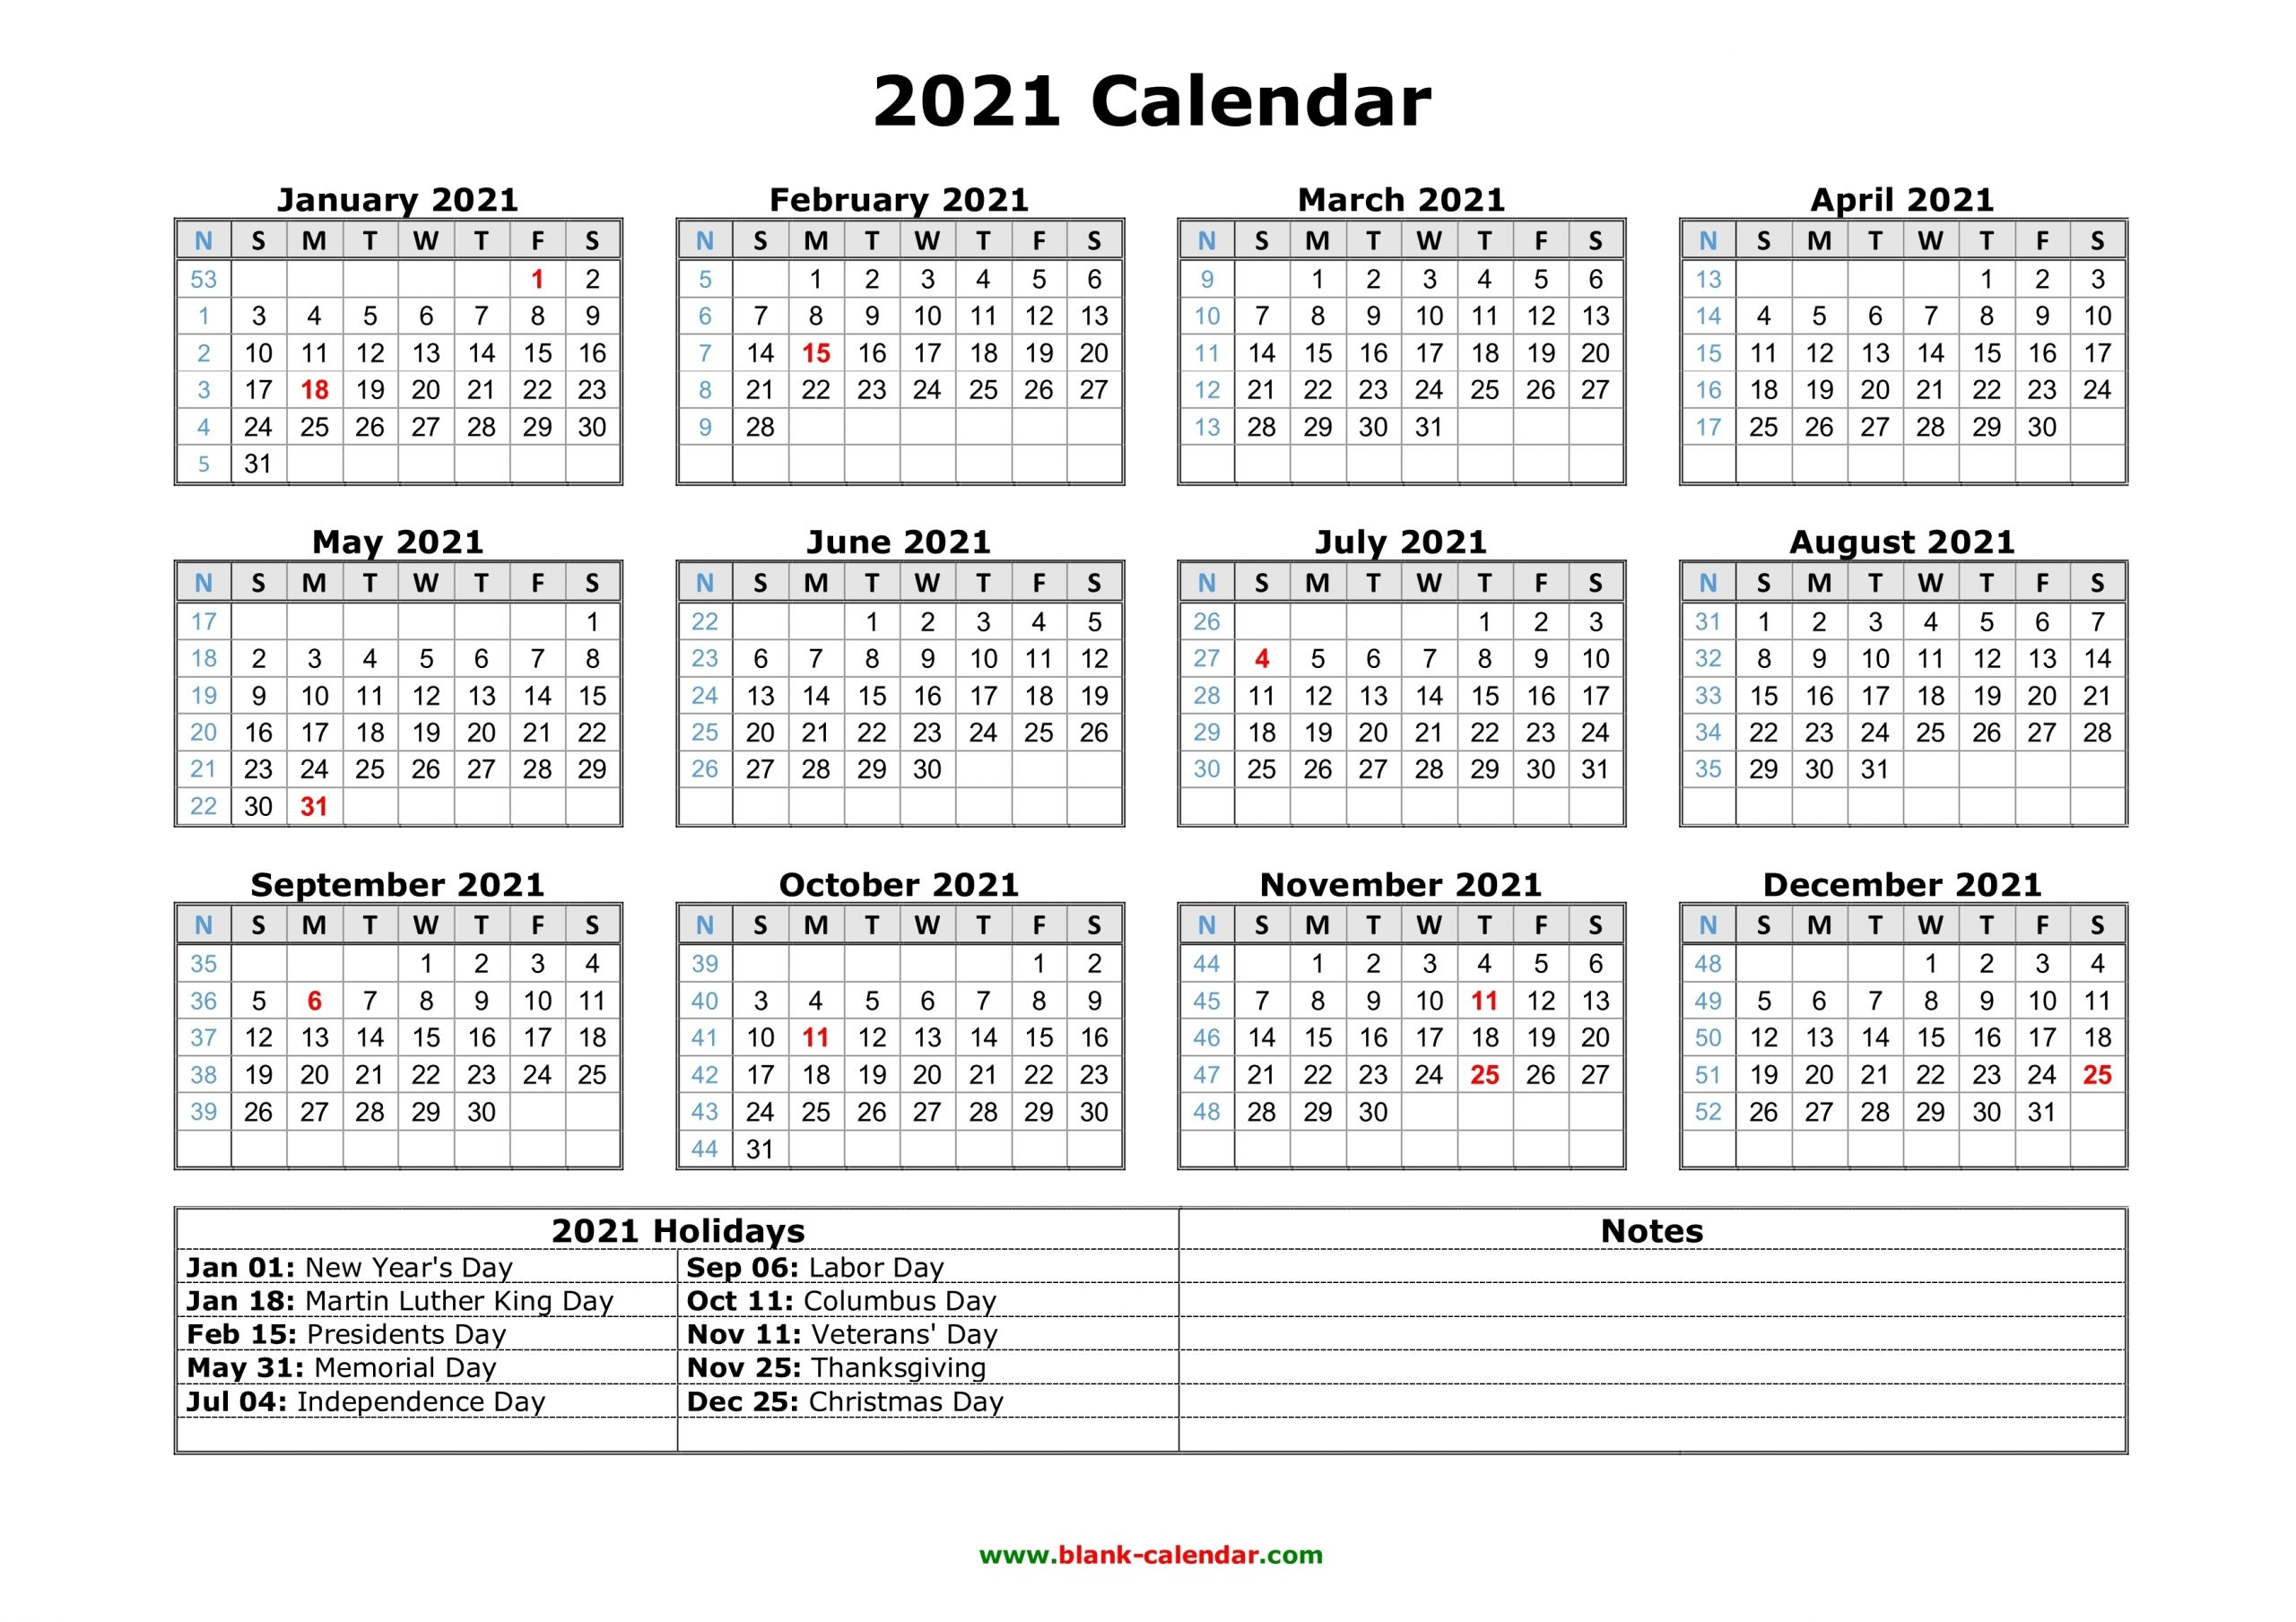 Geico Excel Federal Leave Calendar For 2021 | Calendar with regard to 2021 Lined Calendar Printable Excel